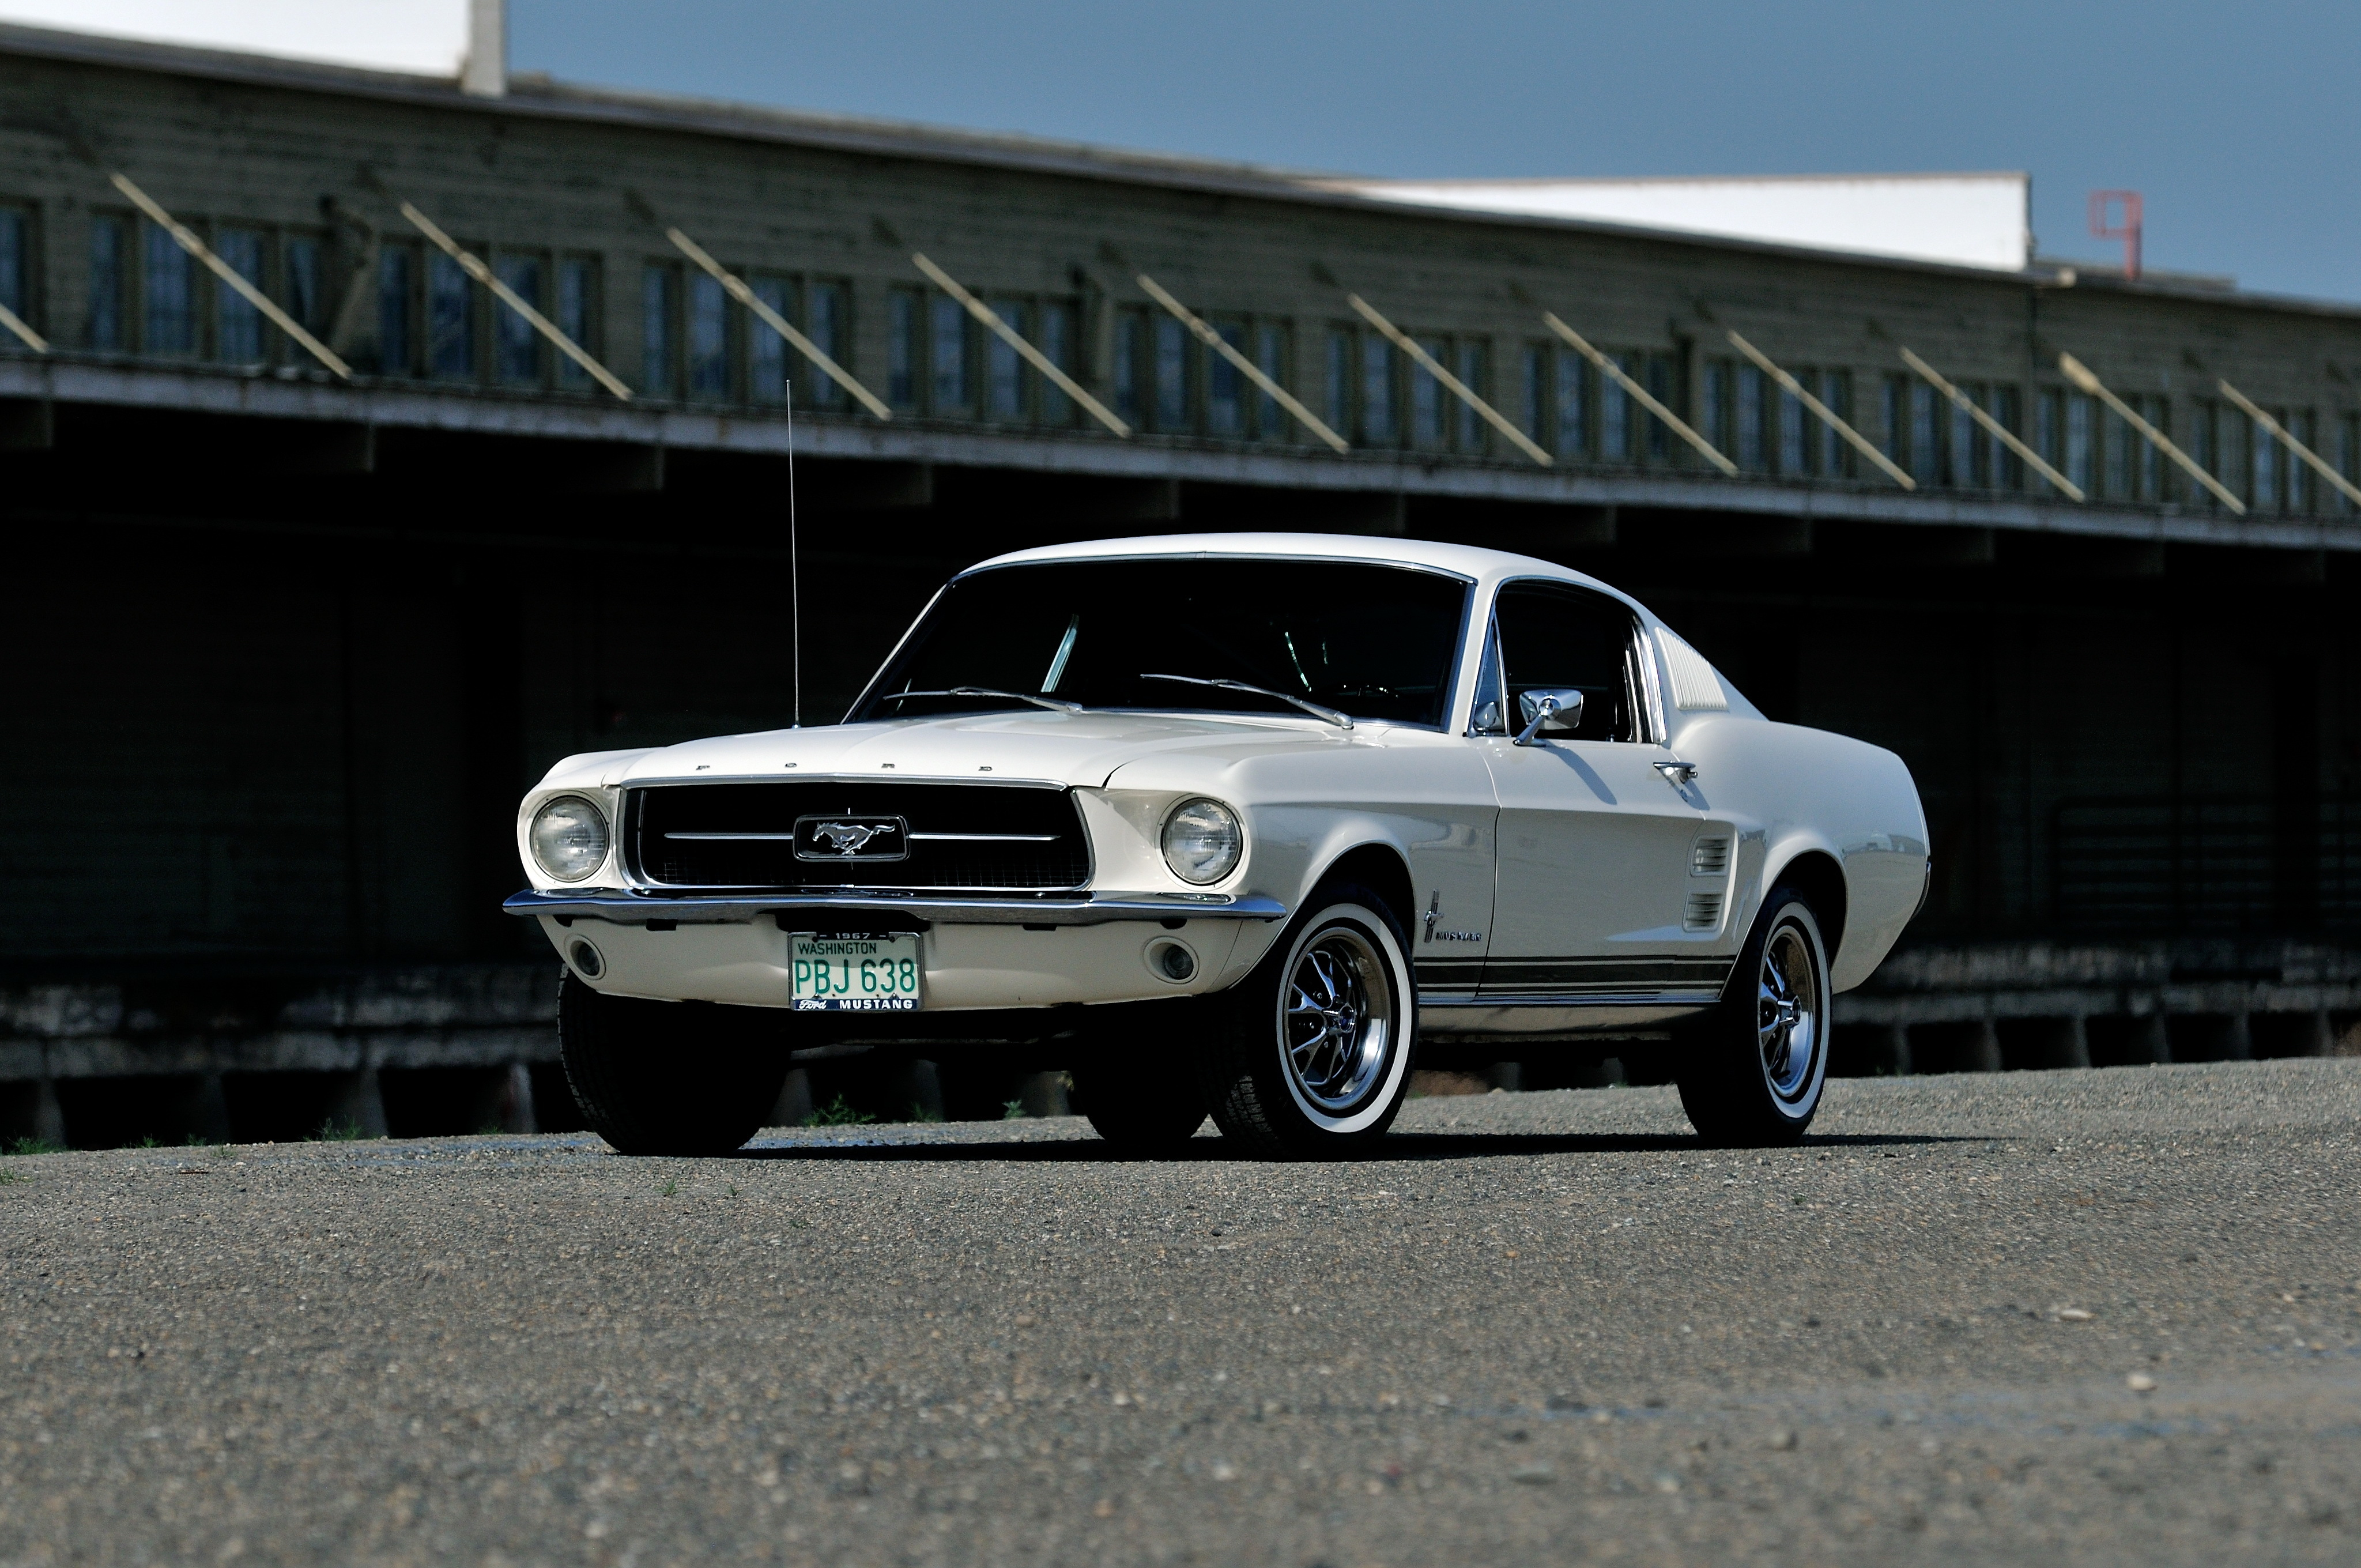 1967 Ford Mustang Fastback 4k Ultra Fondo De Pantalla Hd